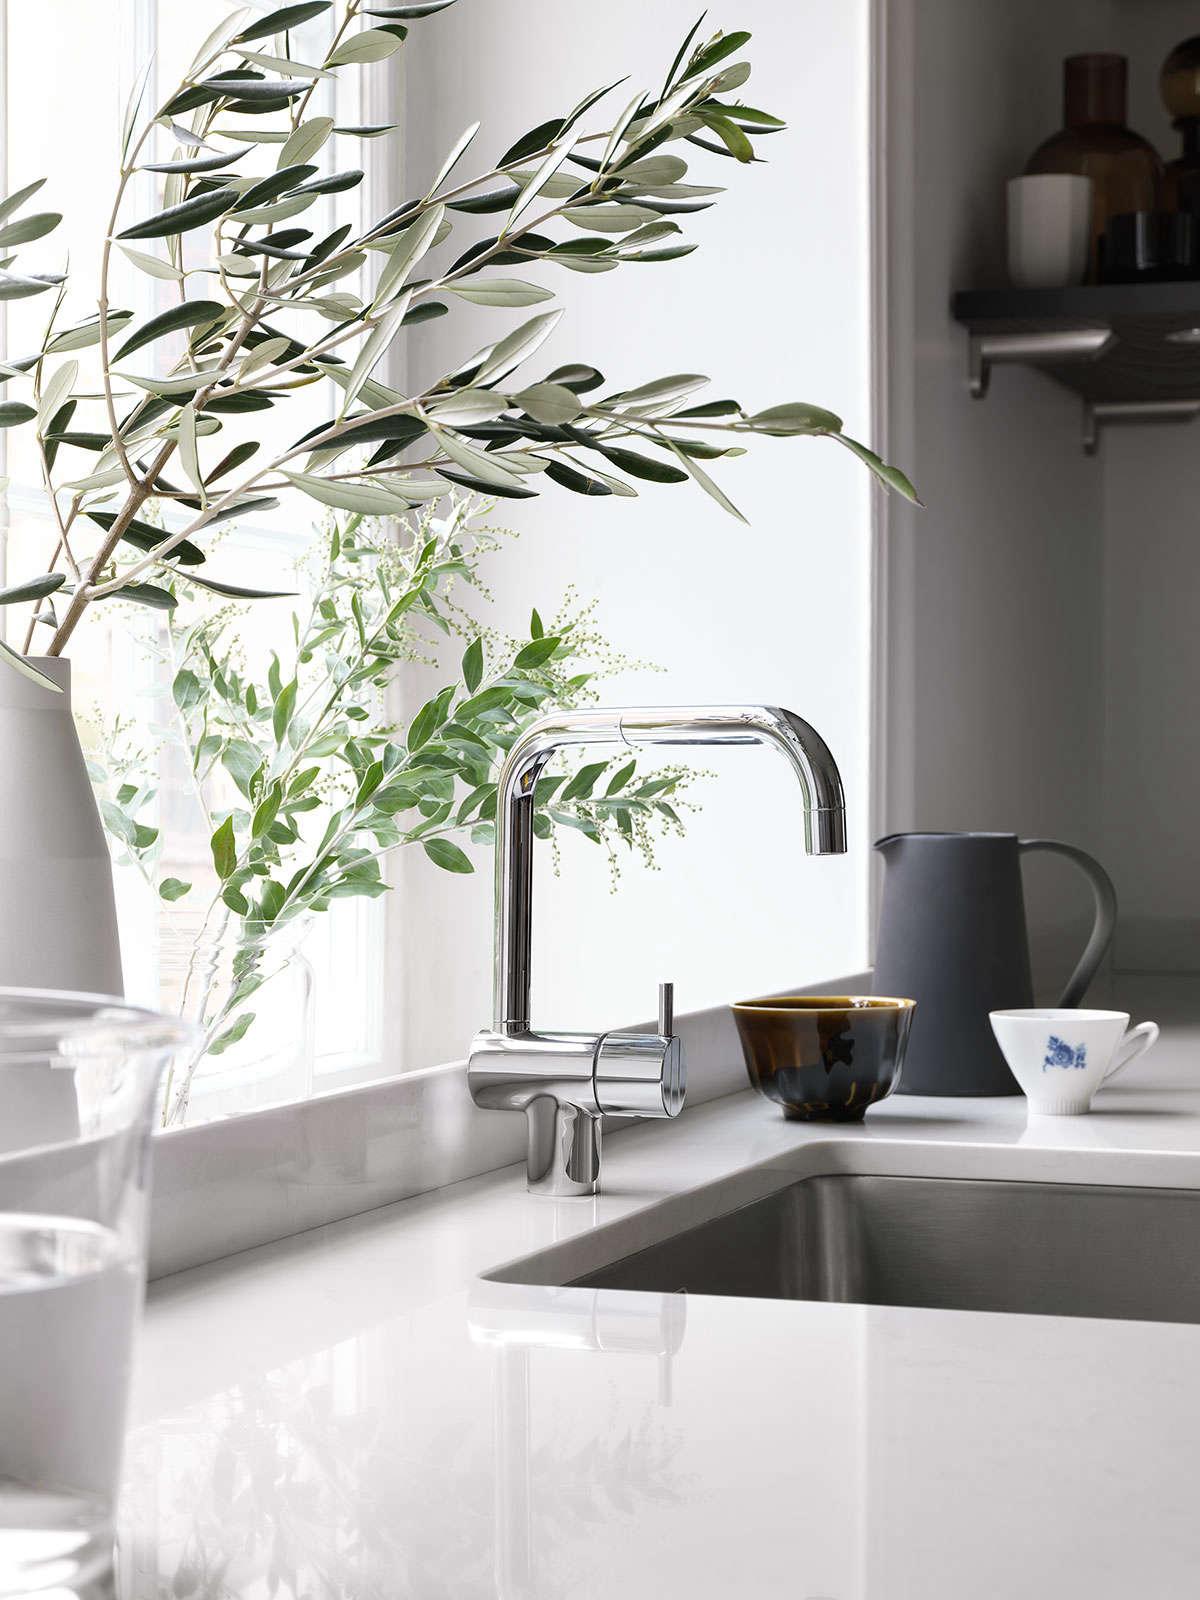 bistro kitchen in ash brown by ballingslov of sweden remodelista 2 13